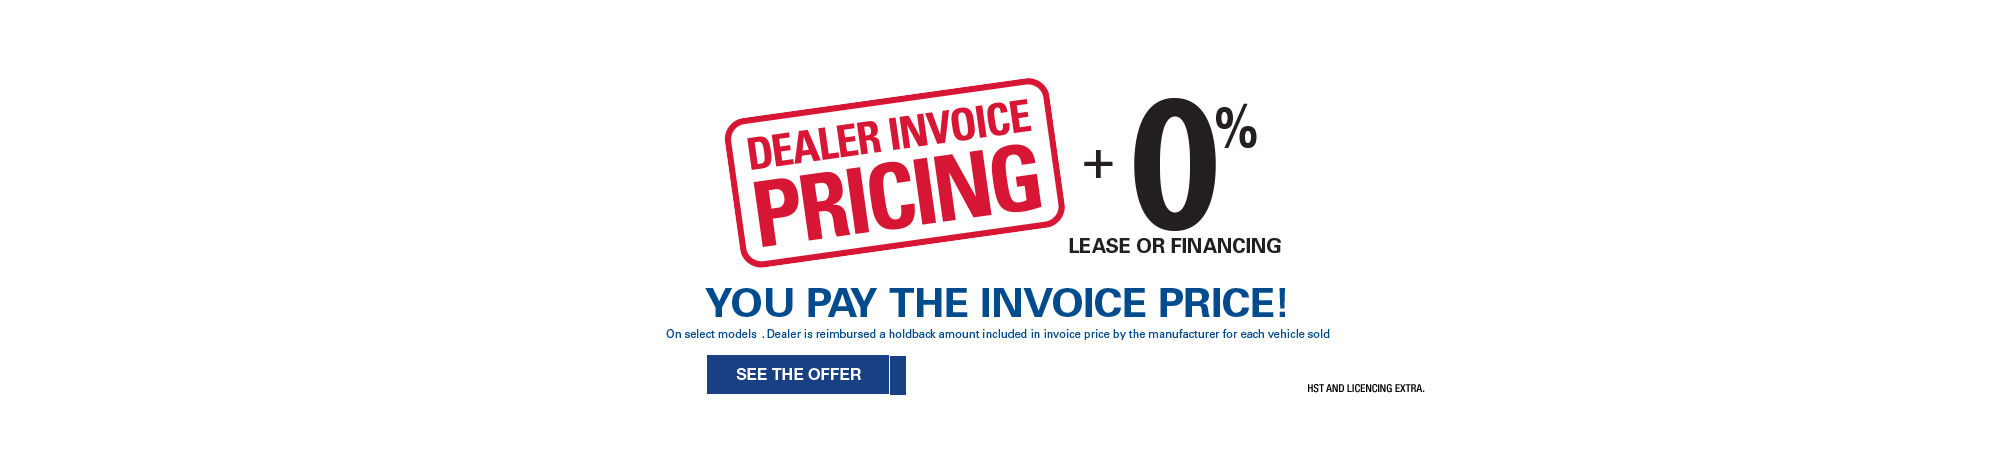 Dealer Invoice Pricing - Event